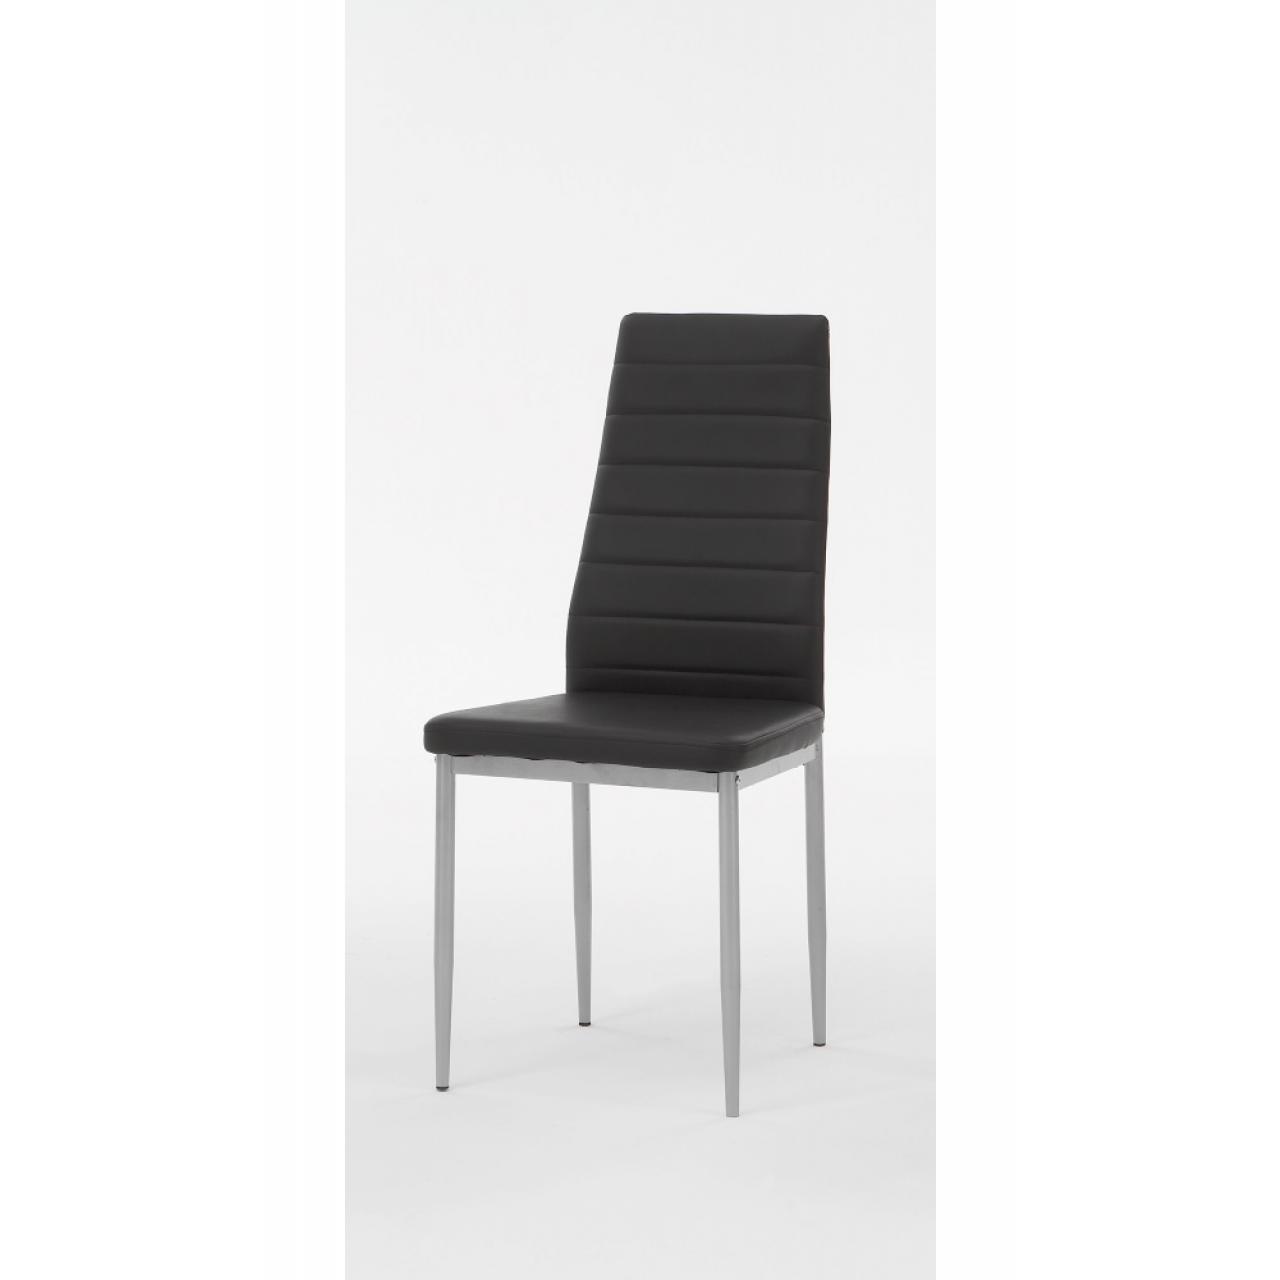 polsterstuhl simone st hle hocker esszimmer wohnen. Black Bedroom Furniture Sets. Home Design Ideas